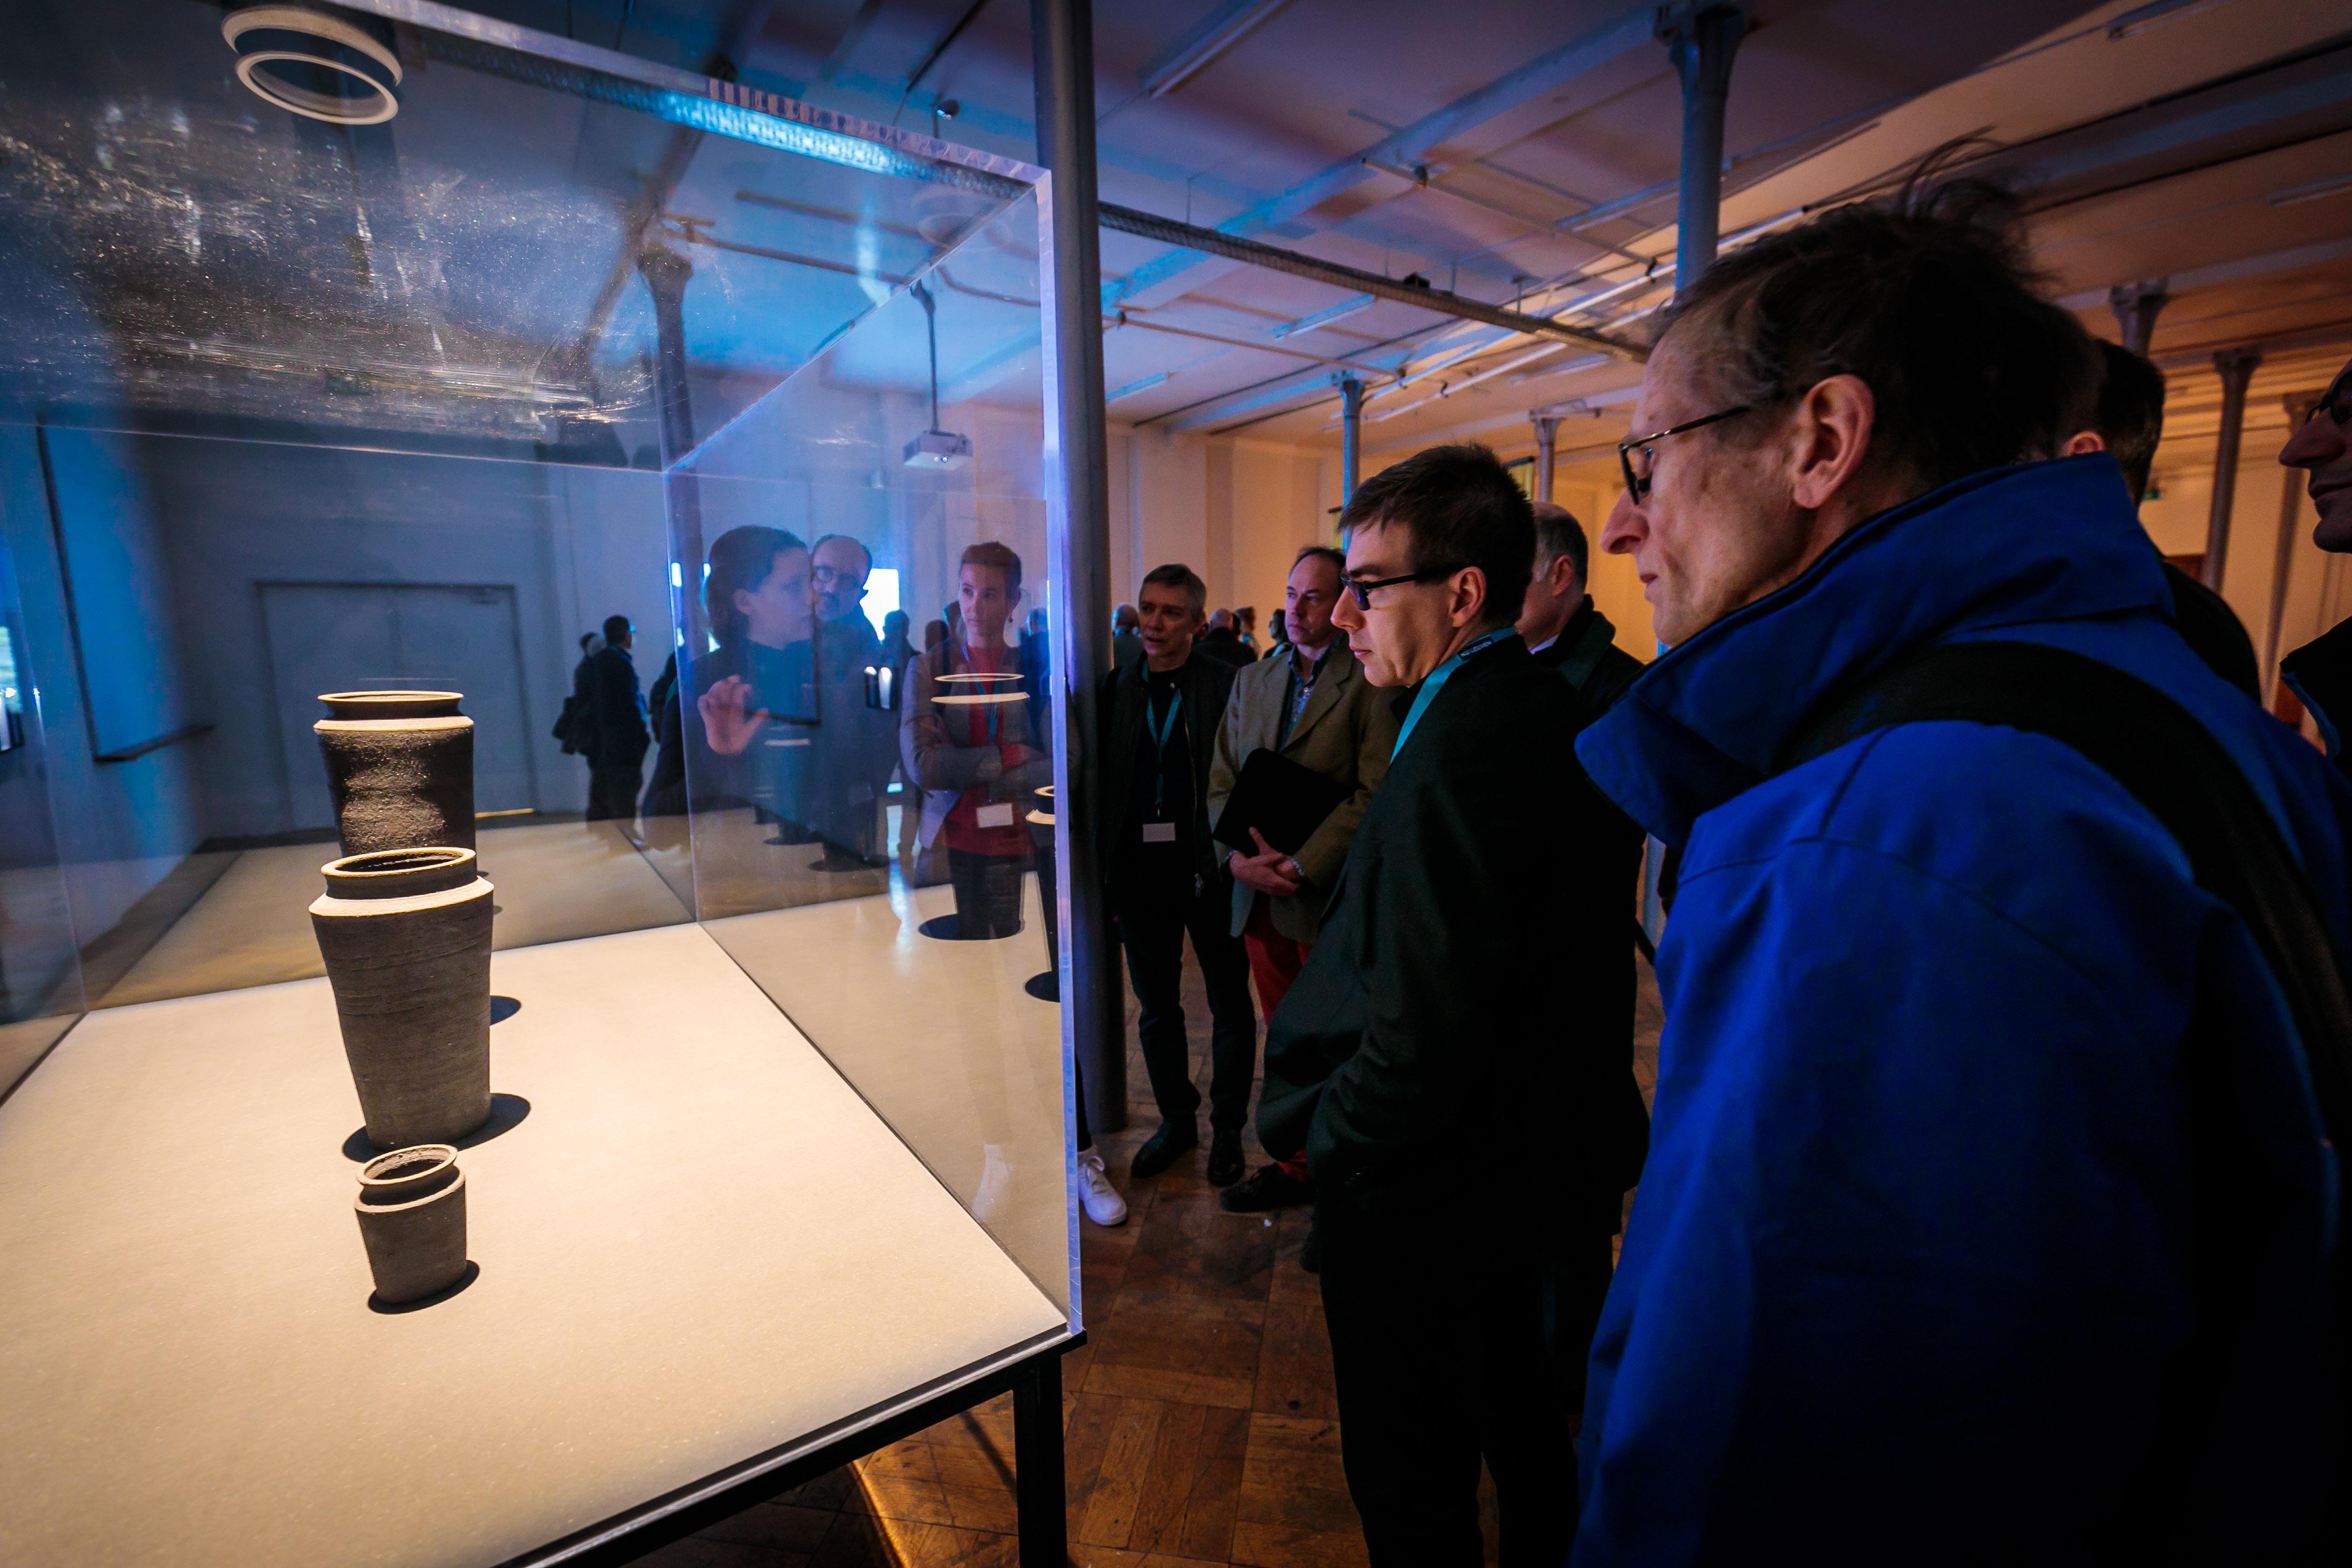 Artefact Exhibition & Speed trip (credits image: Nicolas Herbots)